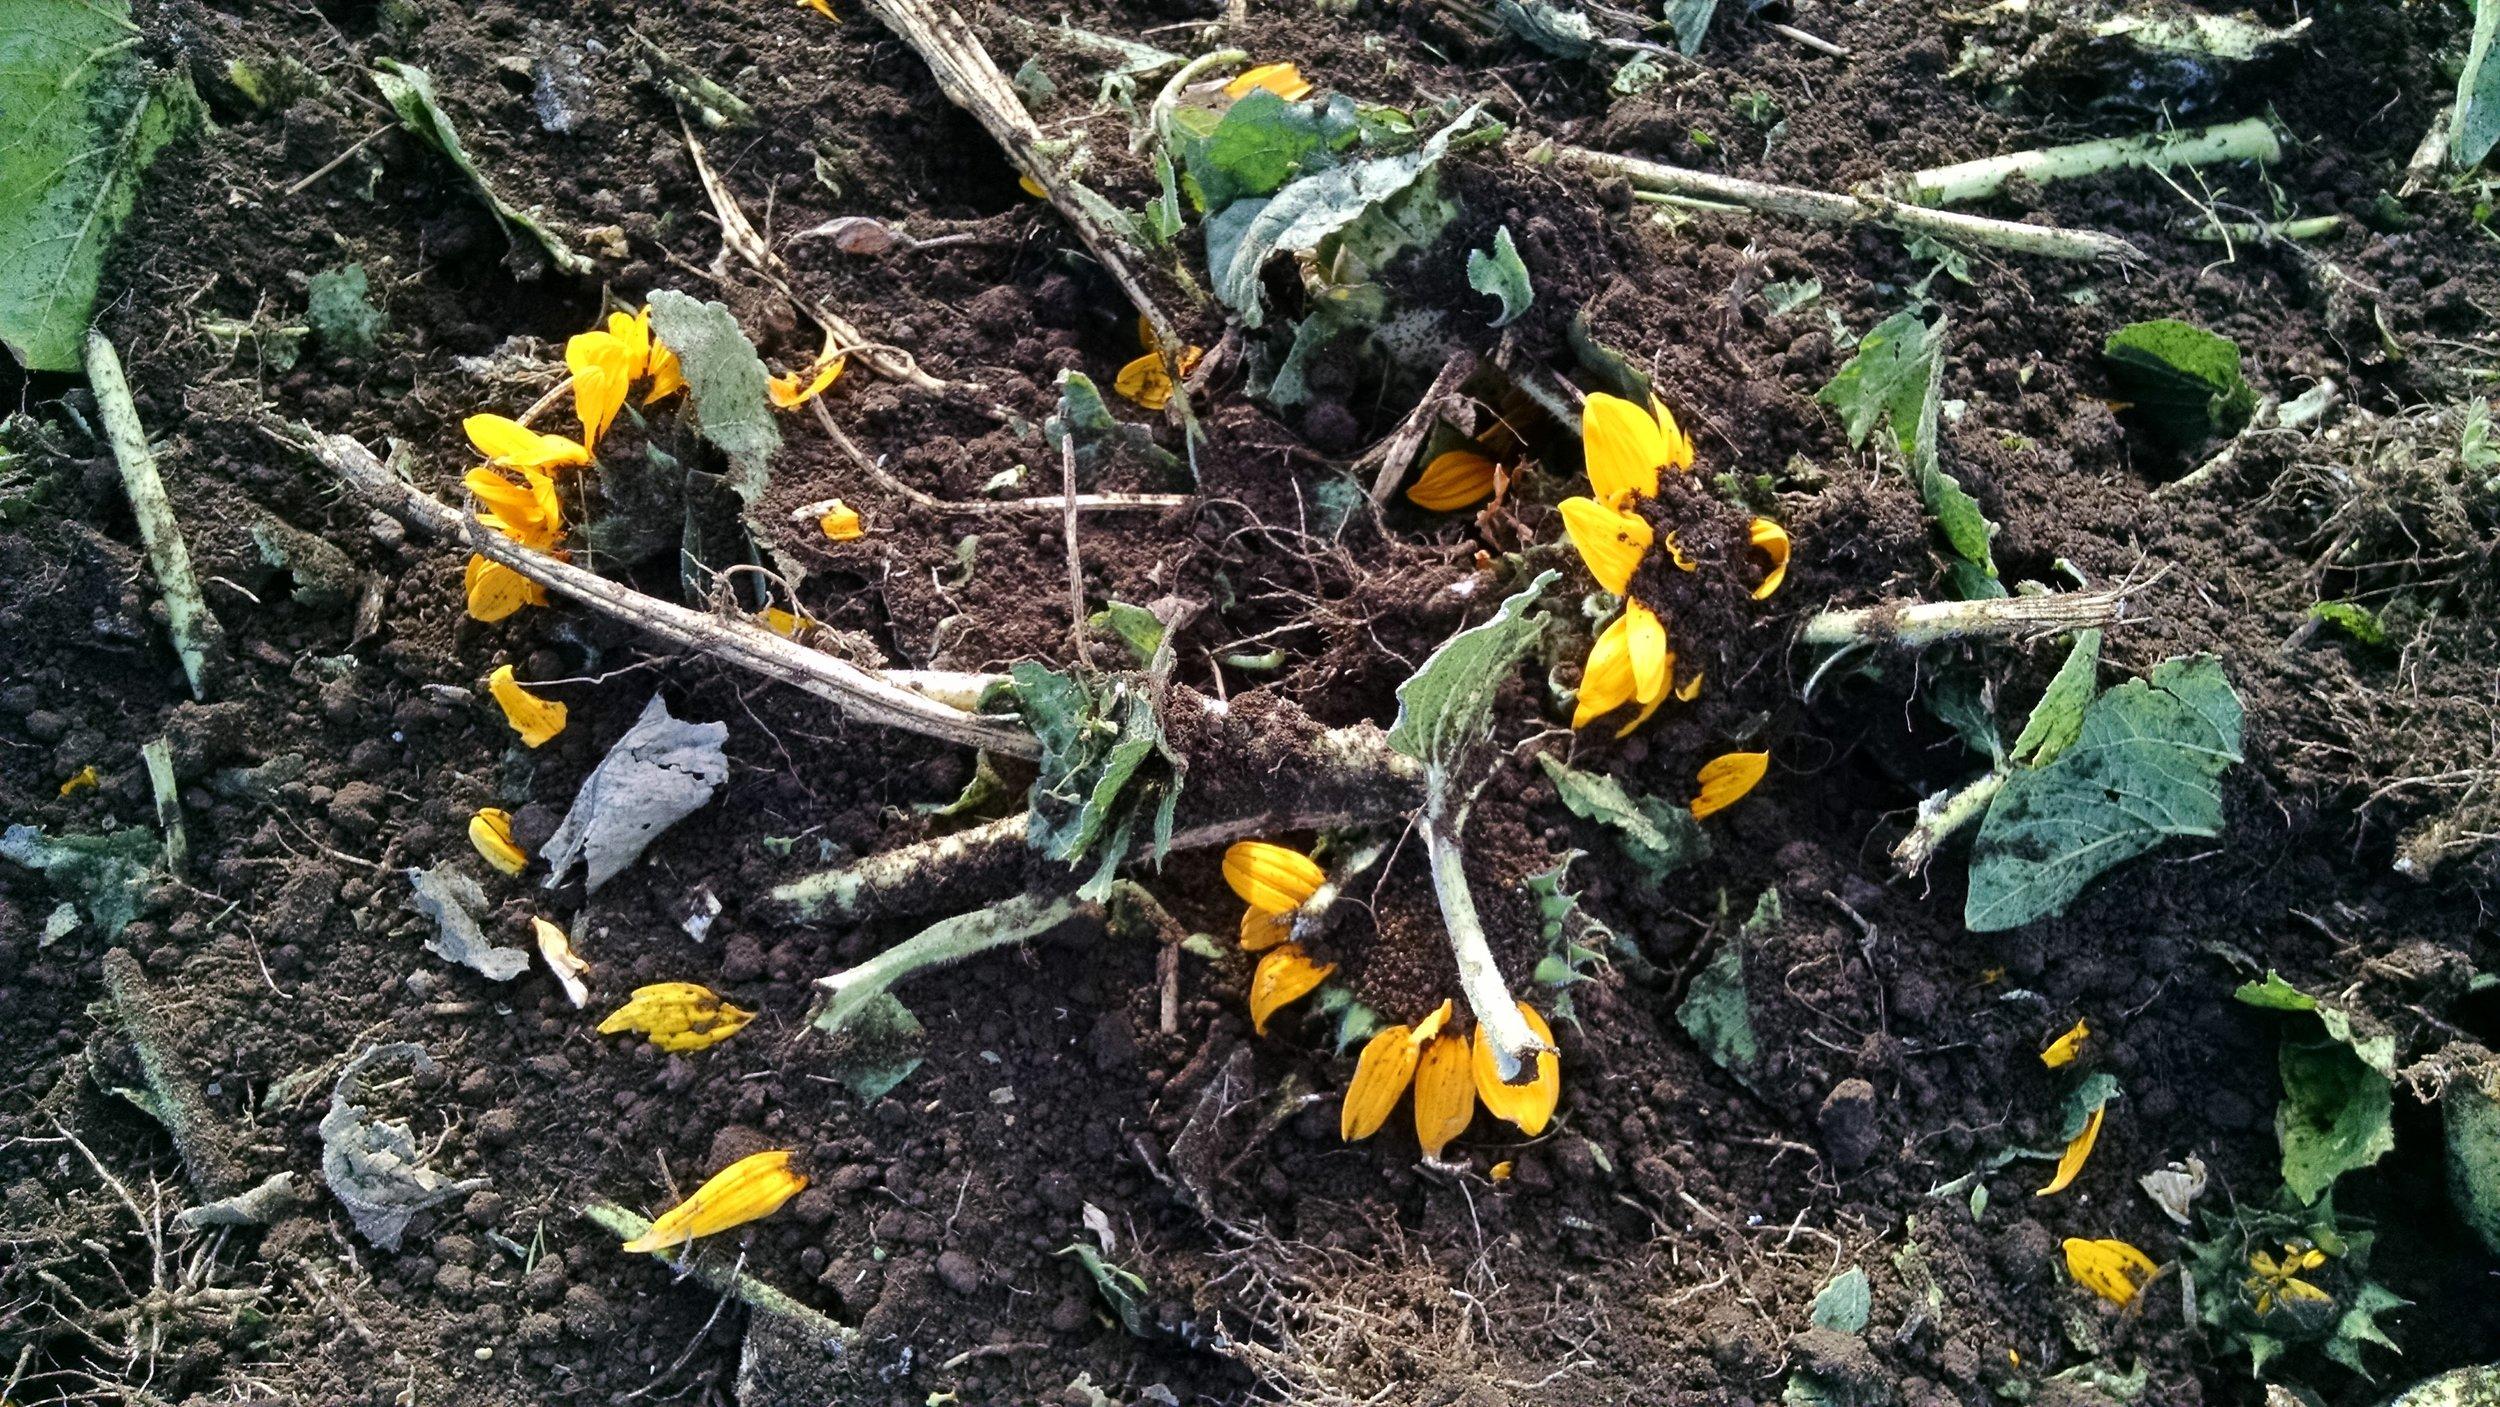 Sunflower petals reentering the earth